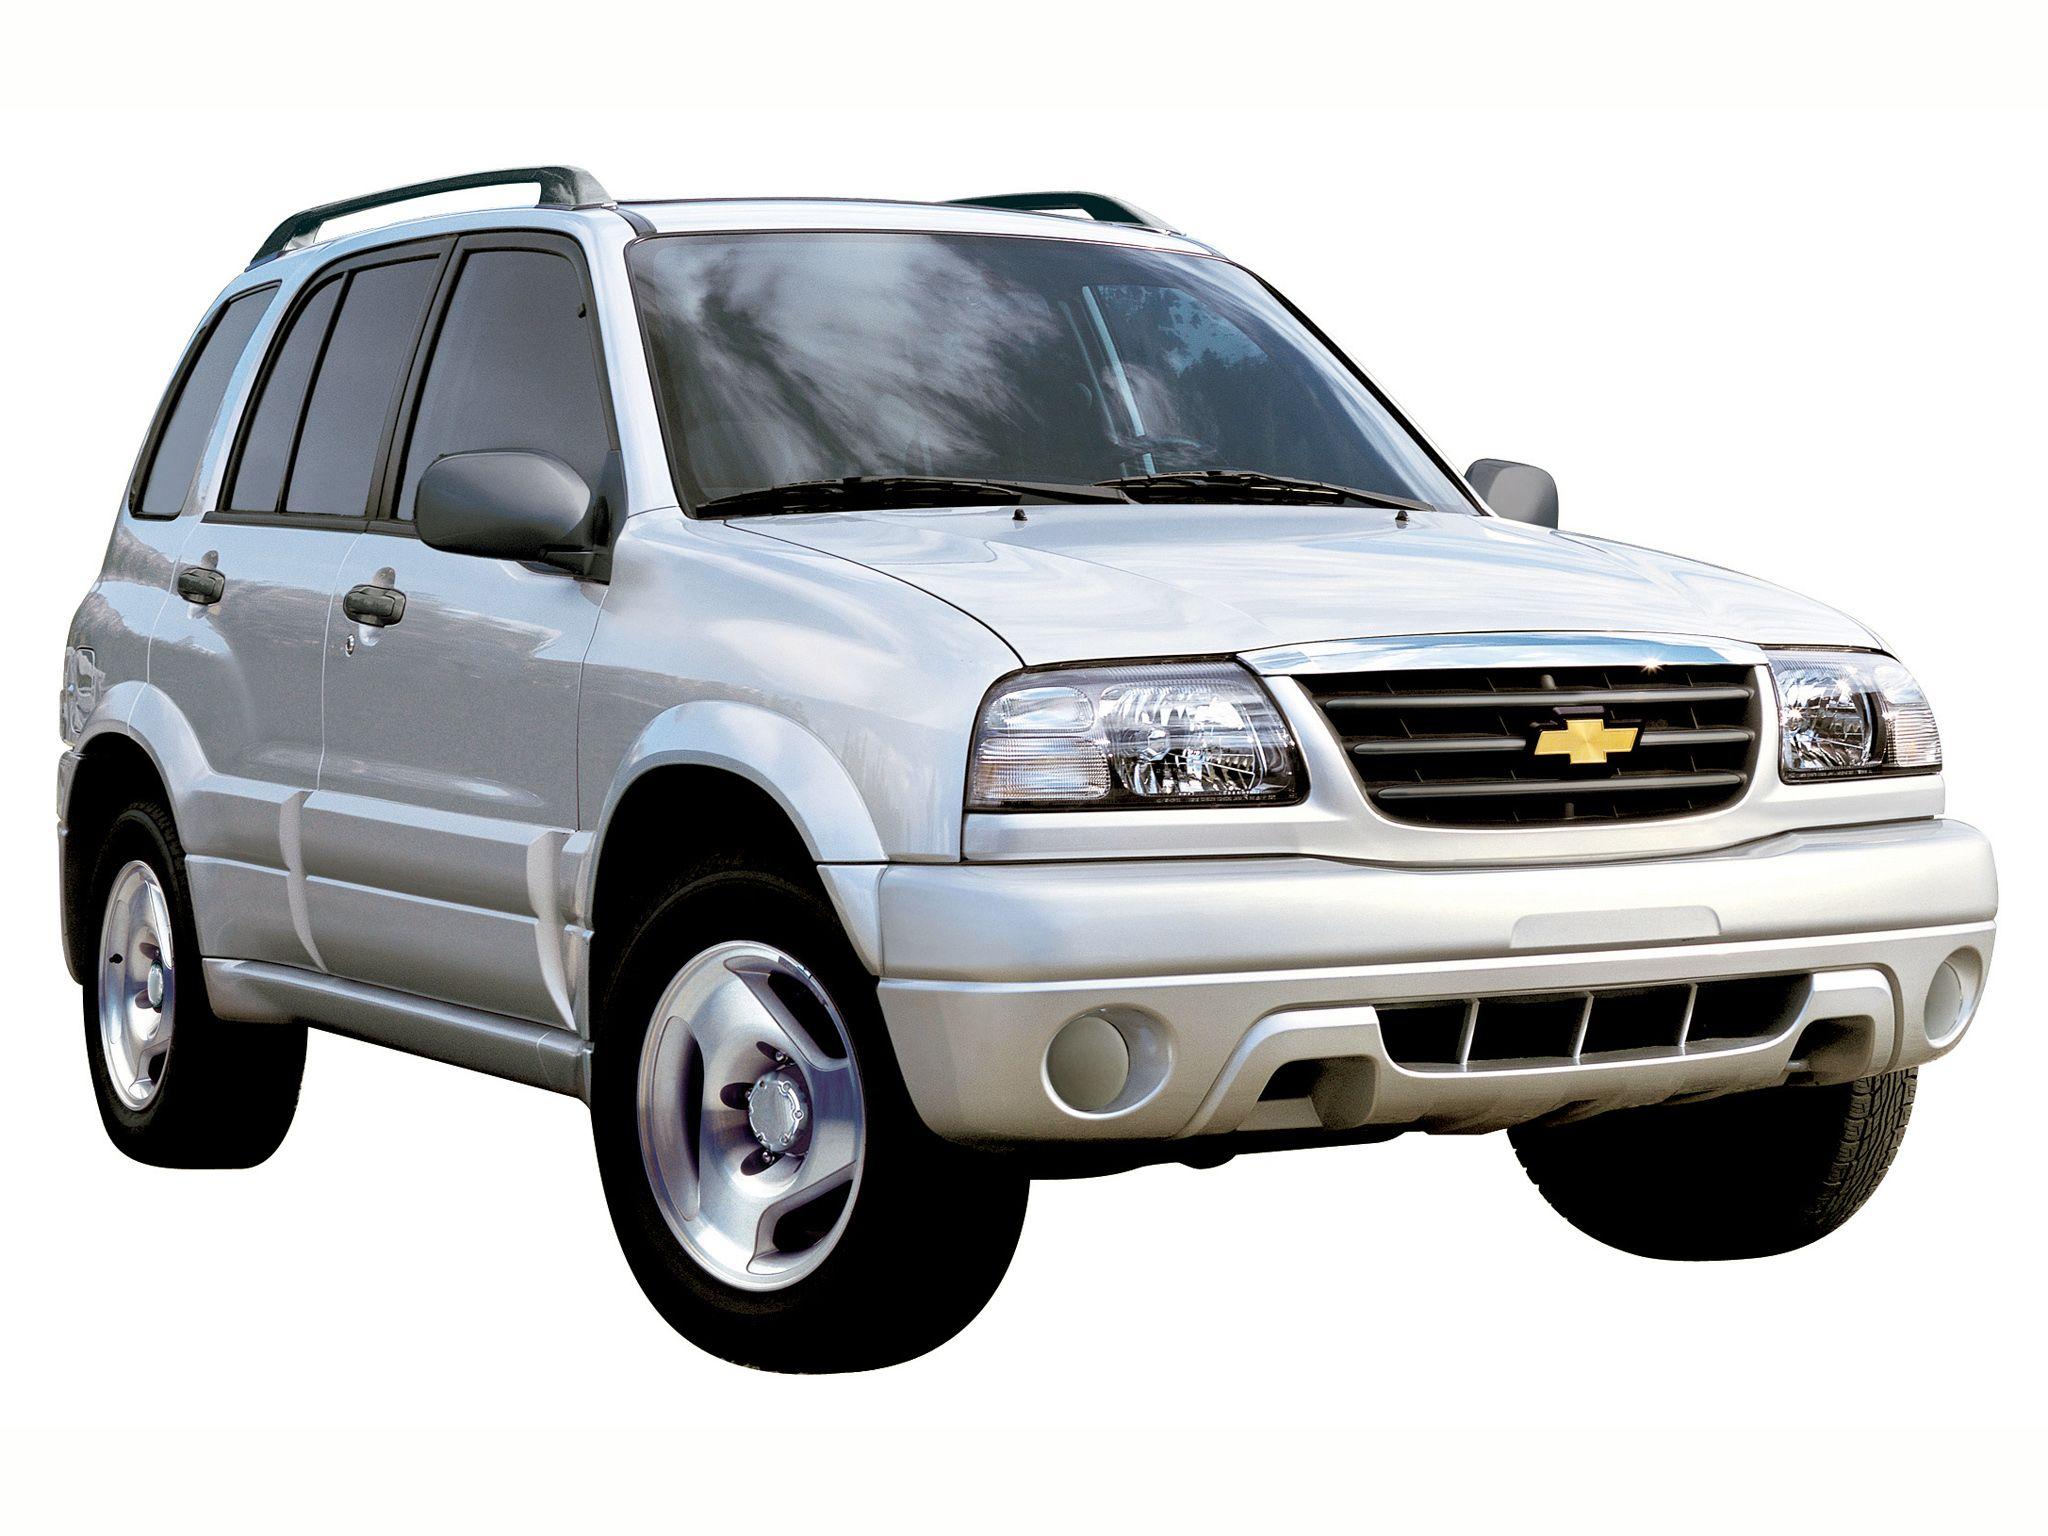 Carmax Rent A Car Alquiler De Autos En Guayaquil Mobil